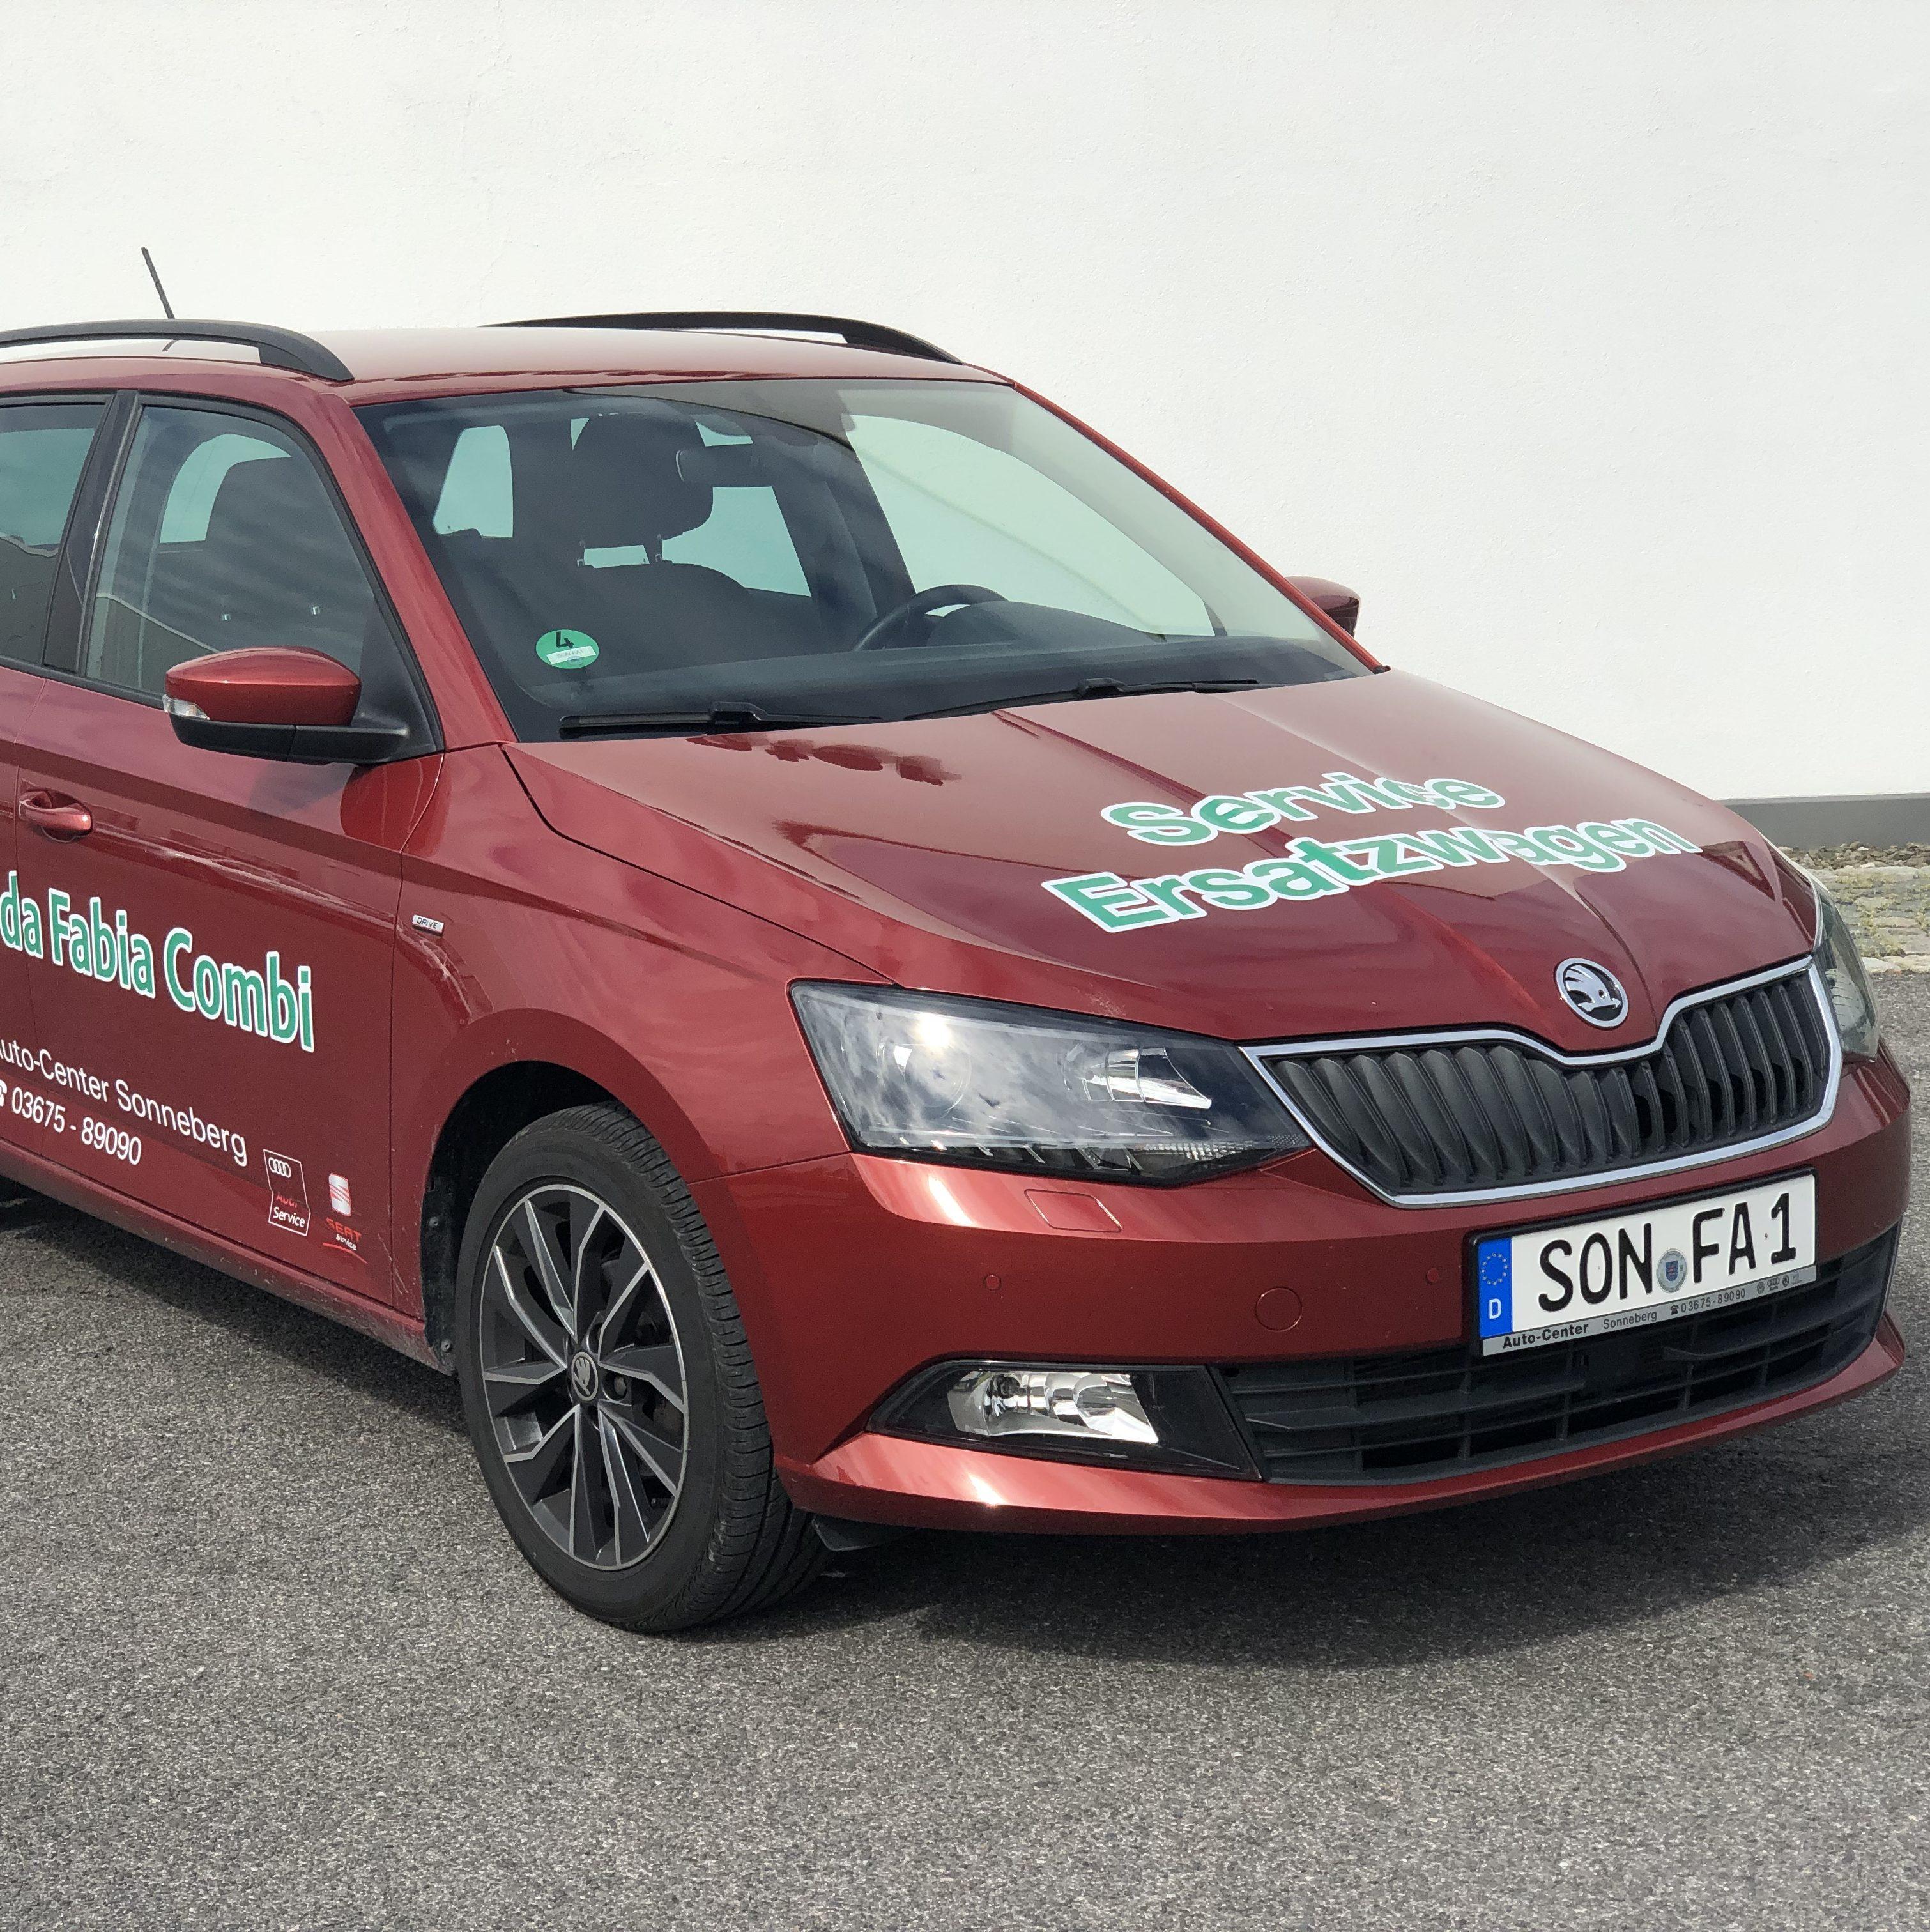 Auto Center Sonneberg